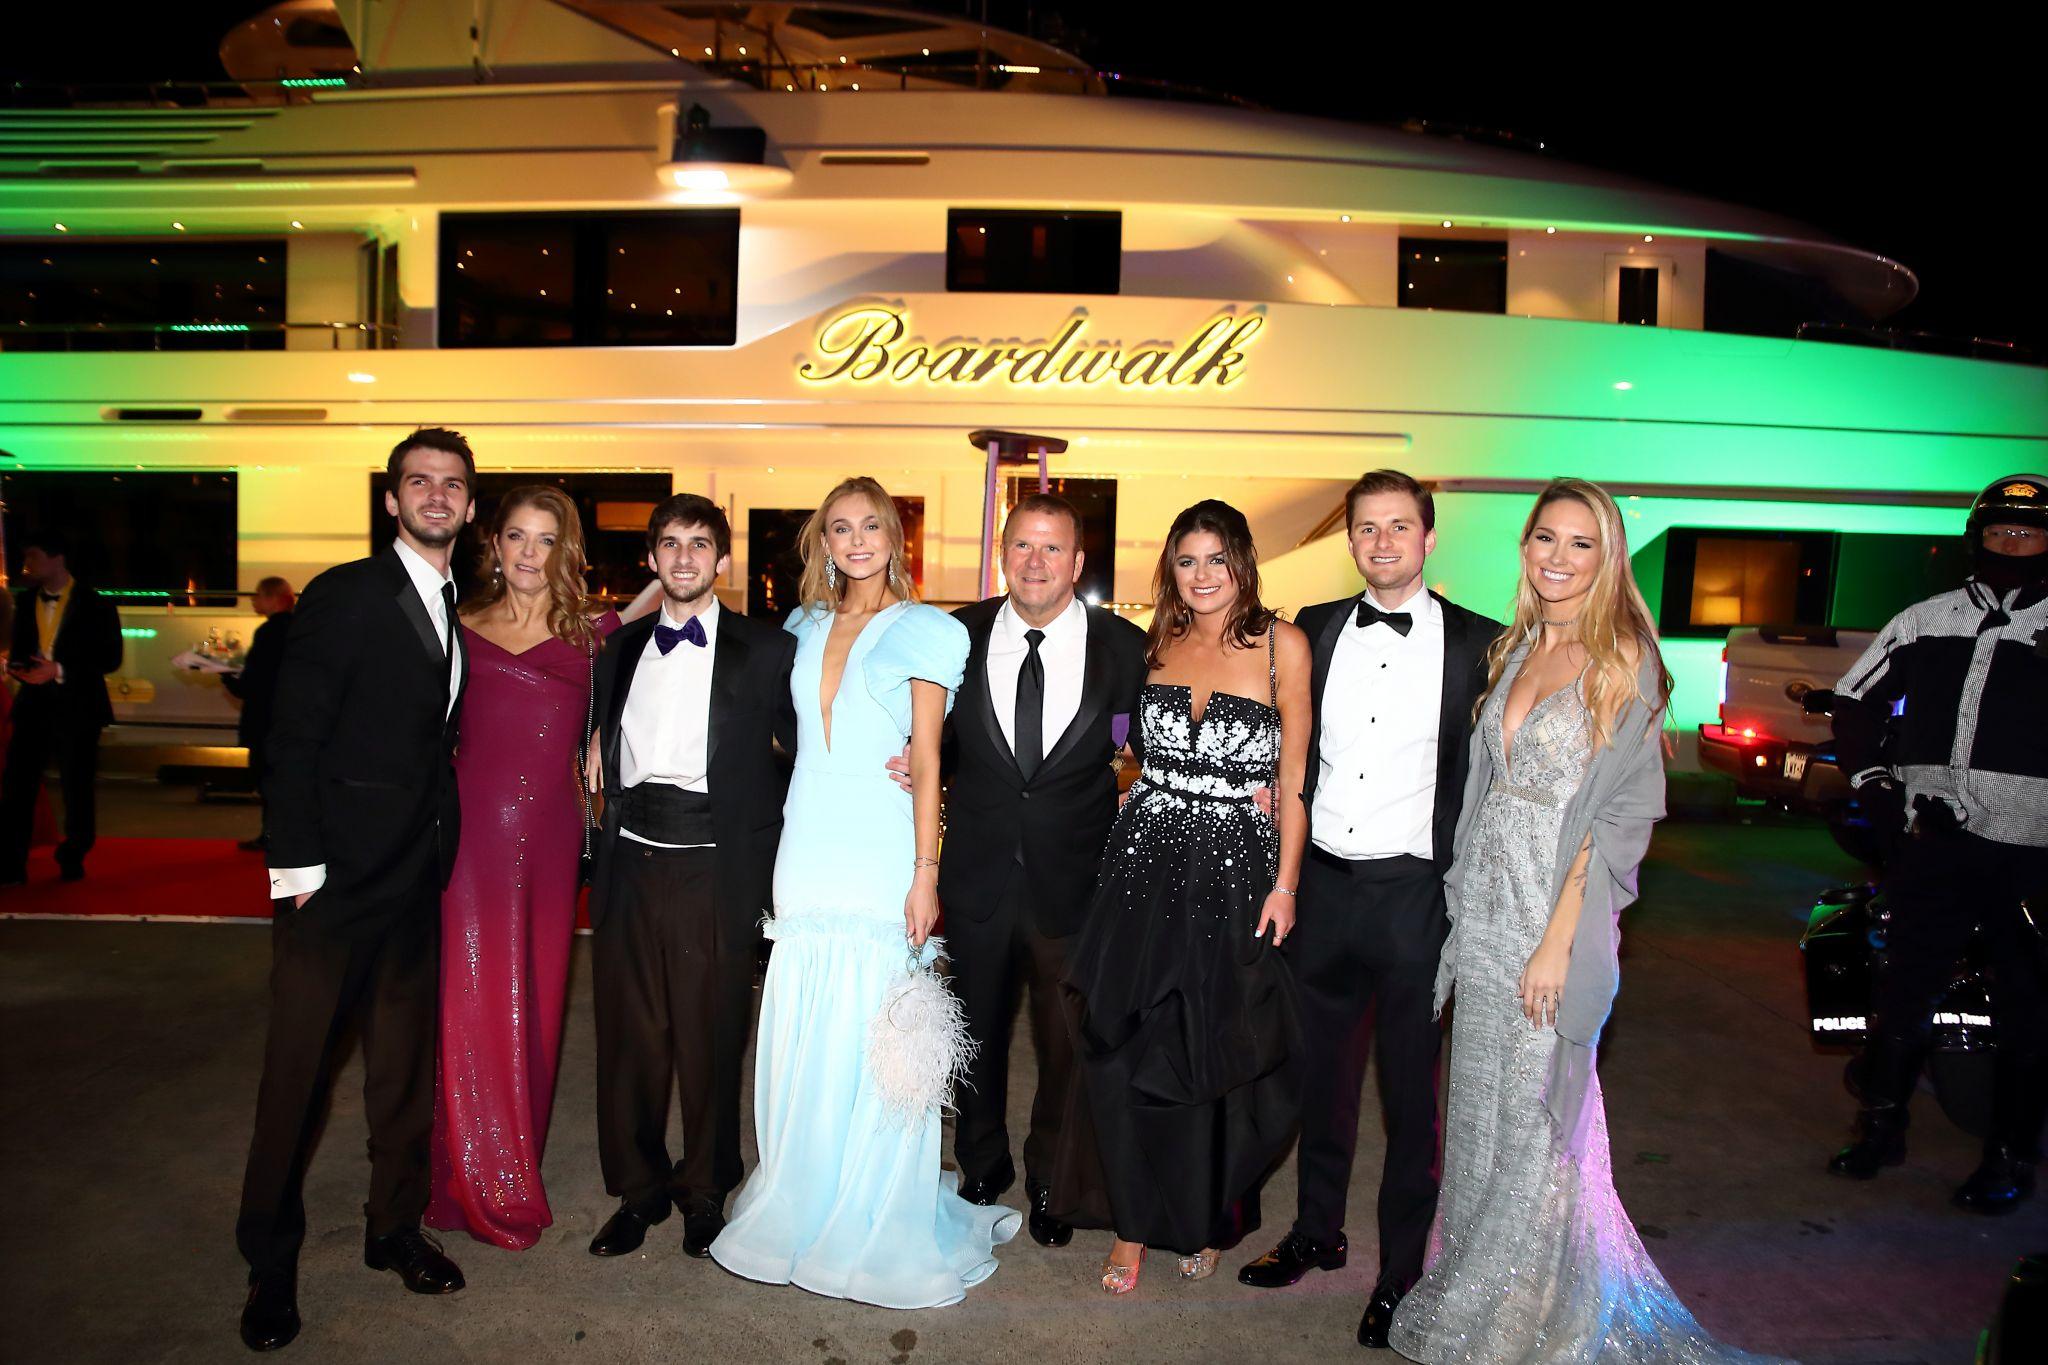 VIP view: The Chainsmokers headline the Fertitta family's 24th annual San Luis Salute in Galveston